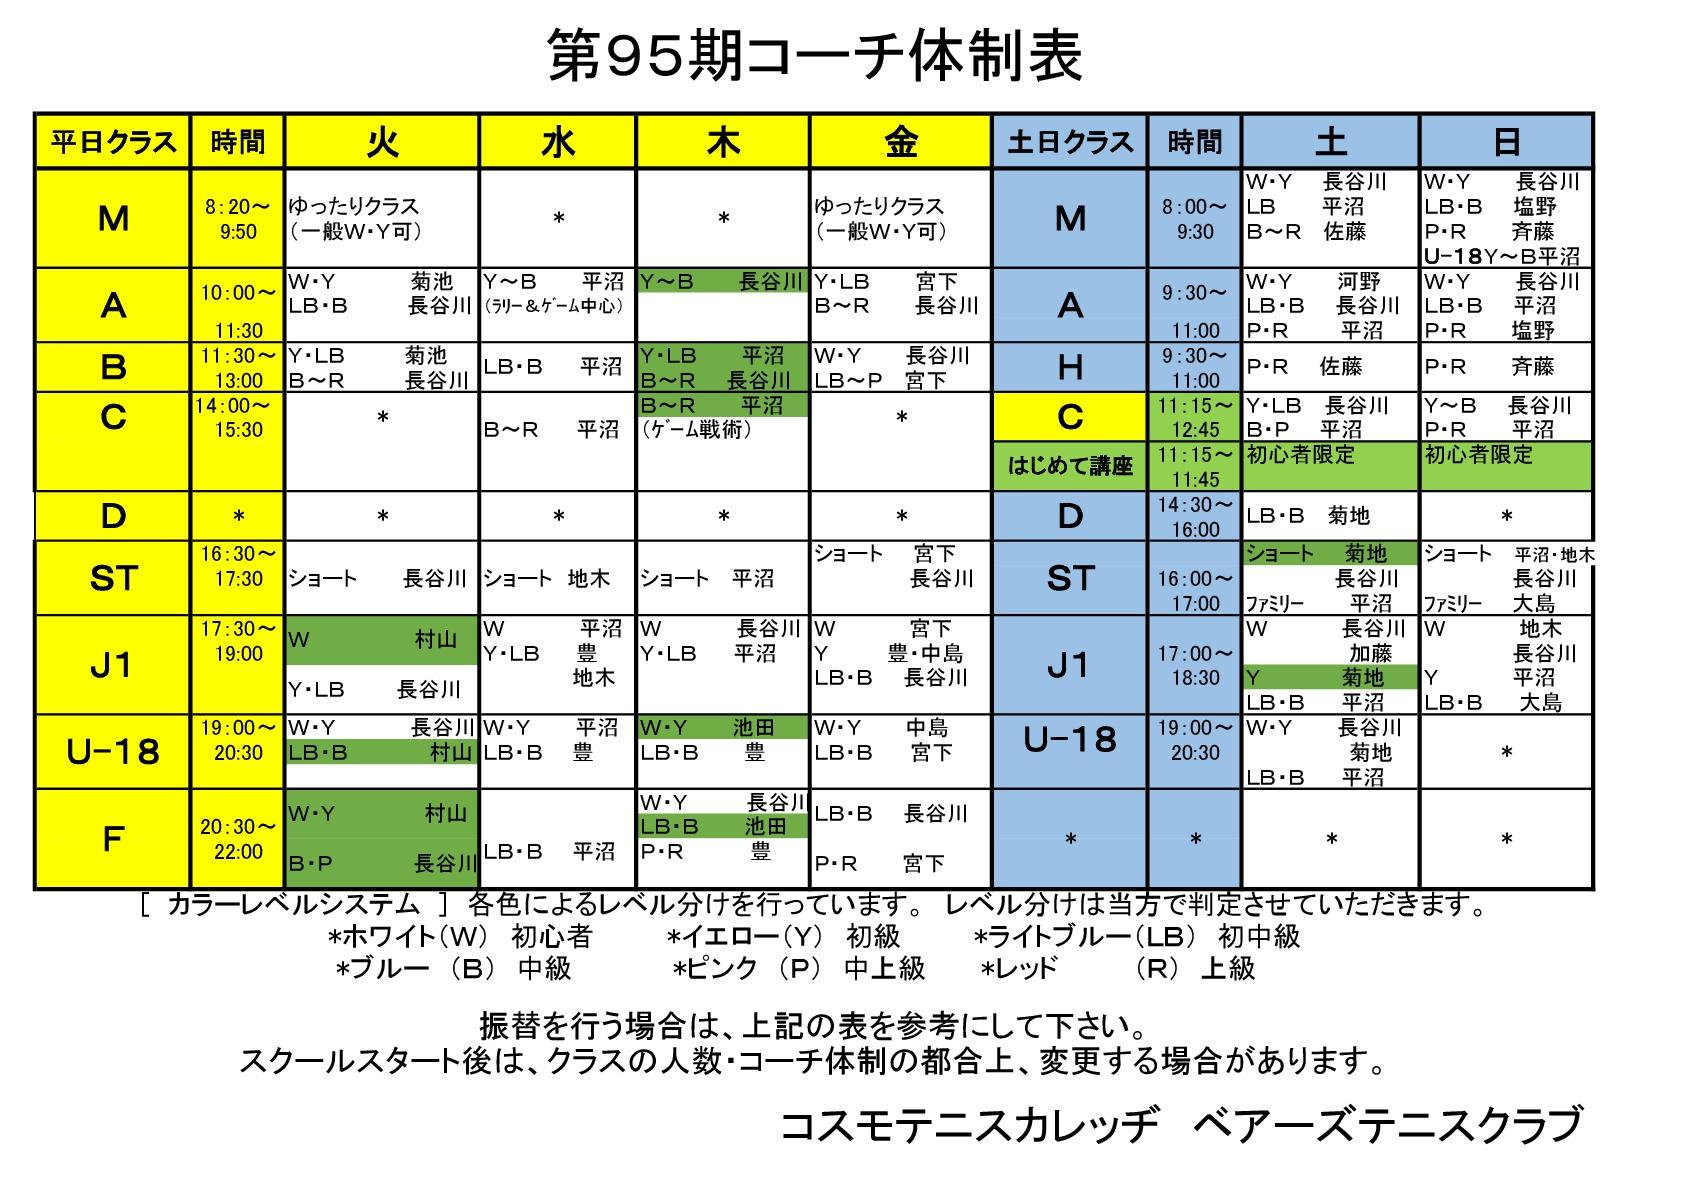 bears95期コーチ体制表